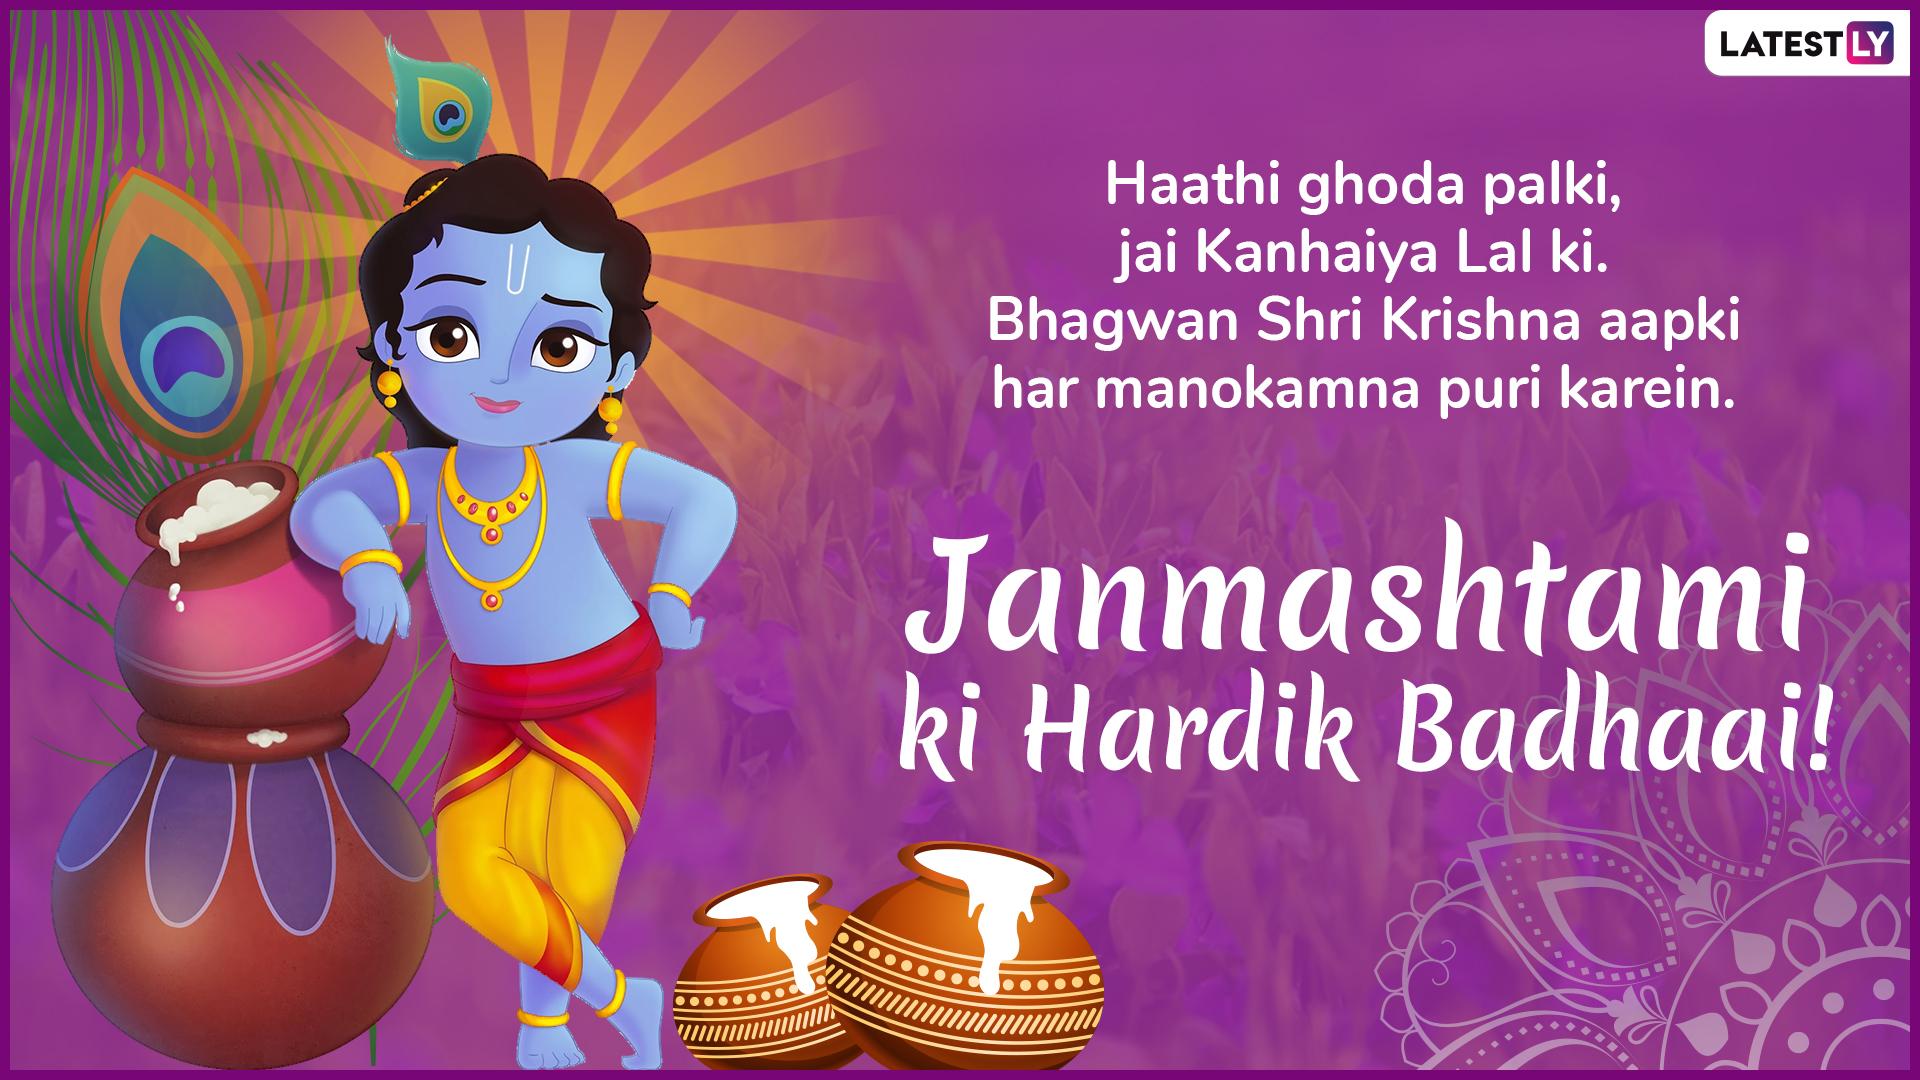 Janmashtami 2019 Hindi WhatsApp Wish 5 (Photo Credits: File Image)